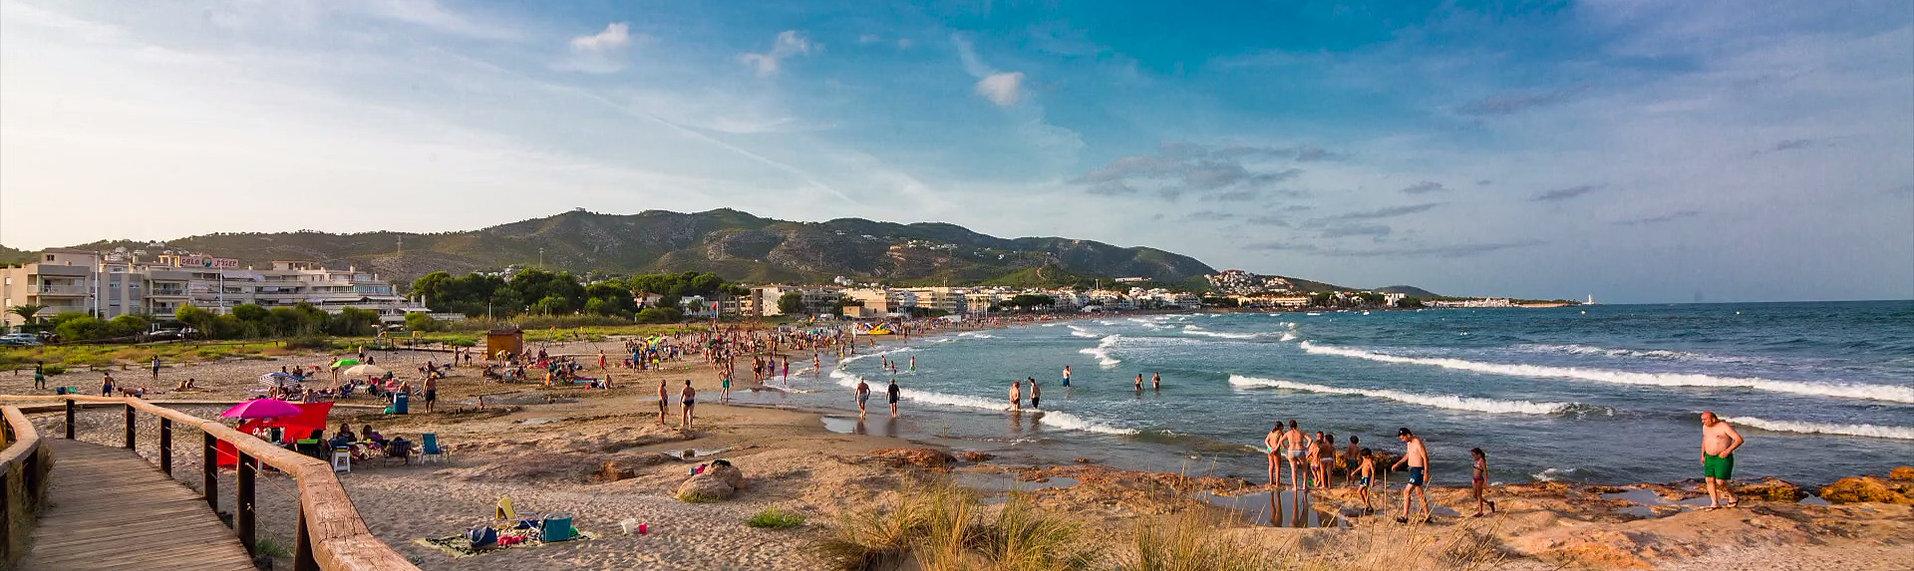 Playa Romana_edited.jpg